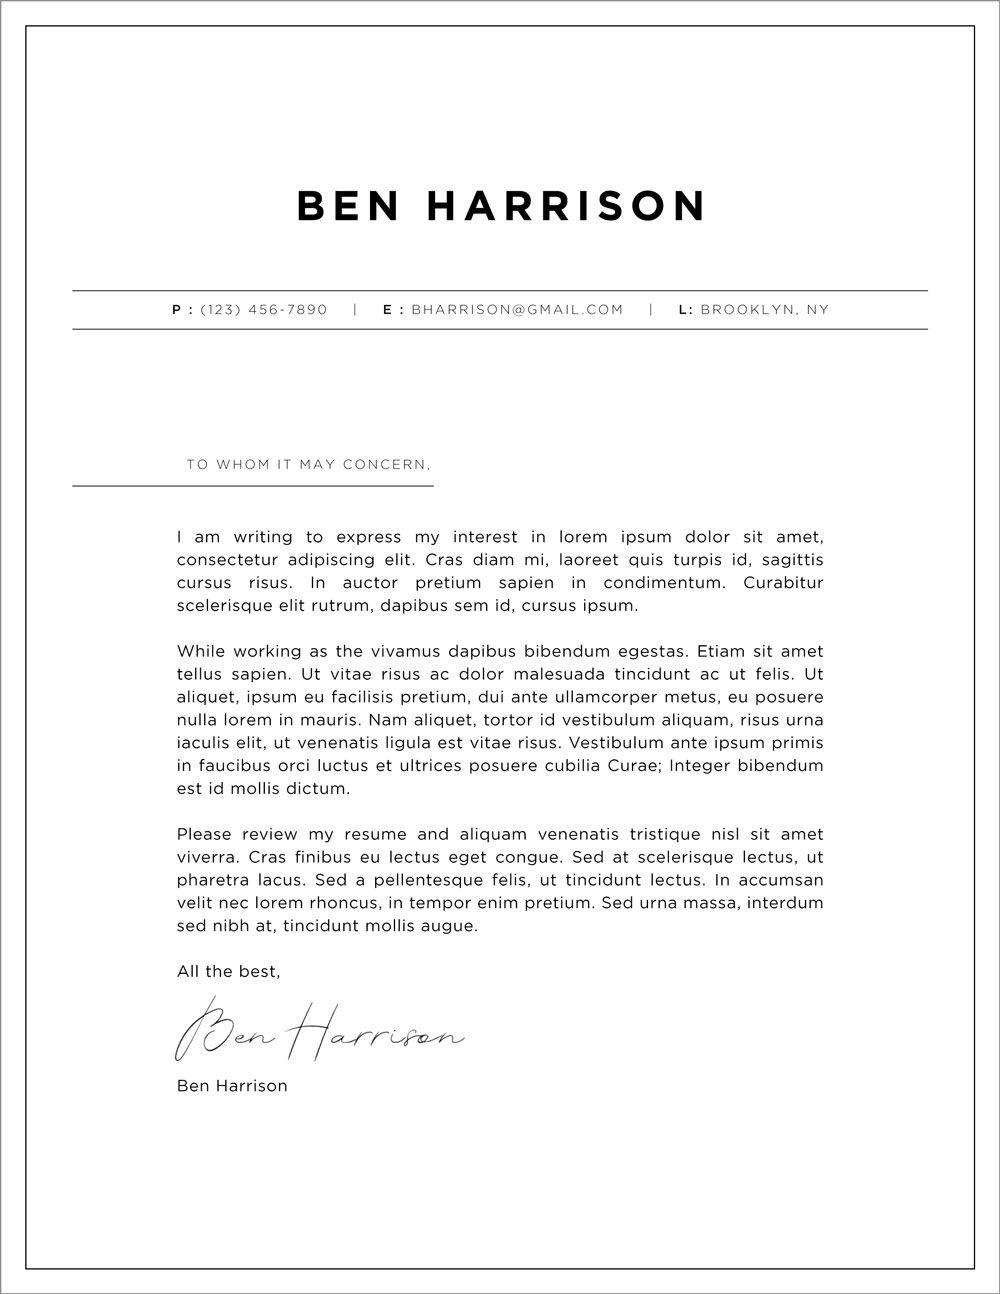 Cover letter design services, resume design template